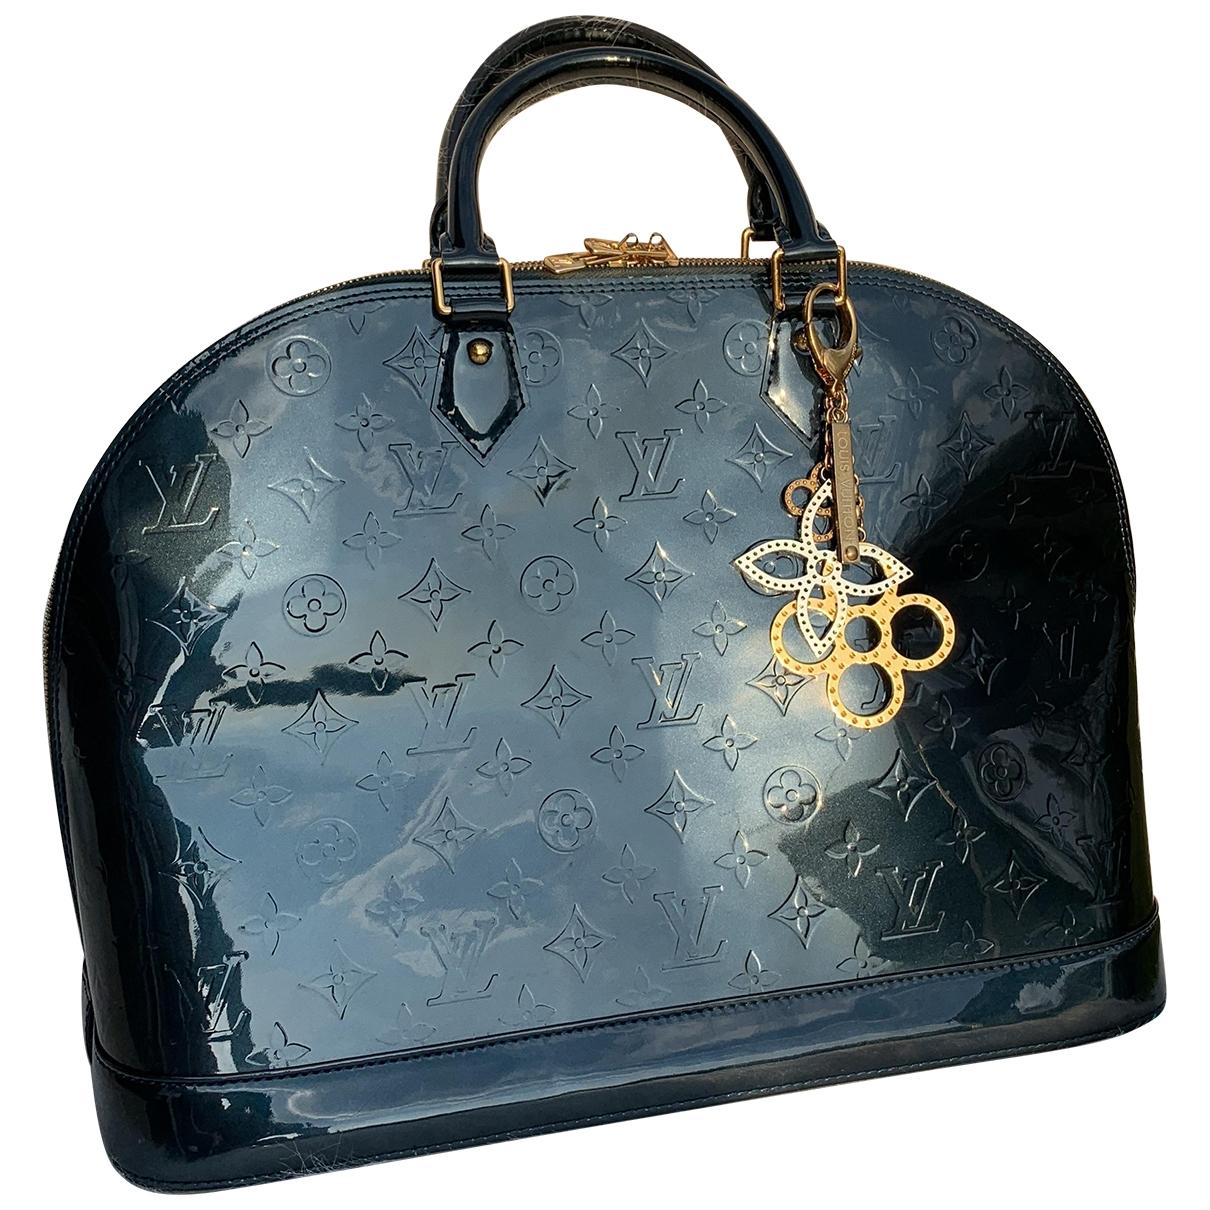 Louis Vuitton Alma Blue Patent leather handbag for Women \N